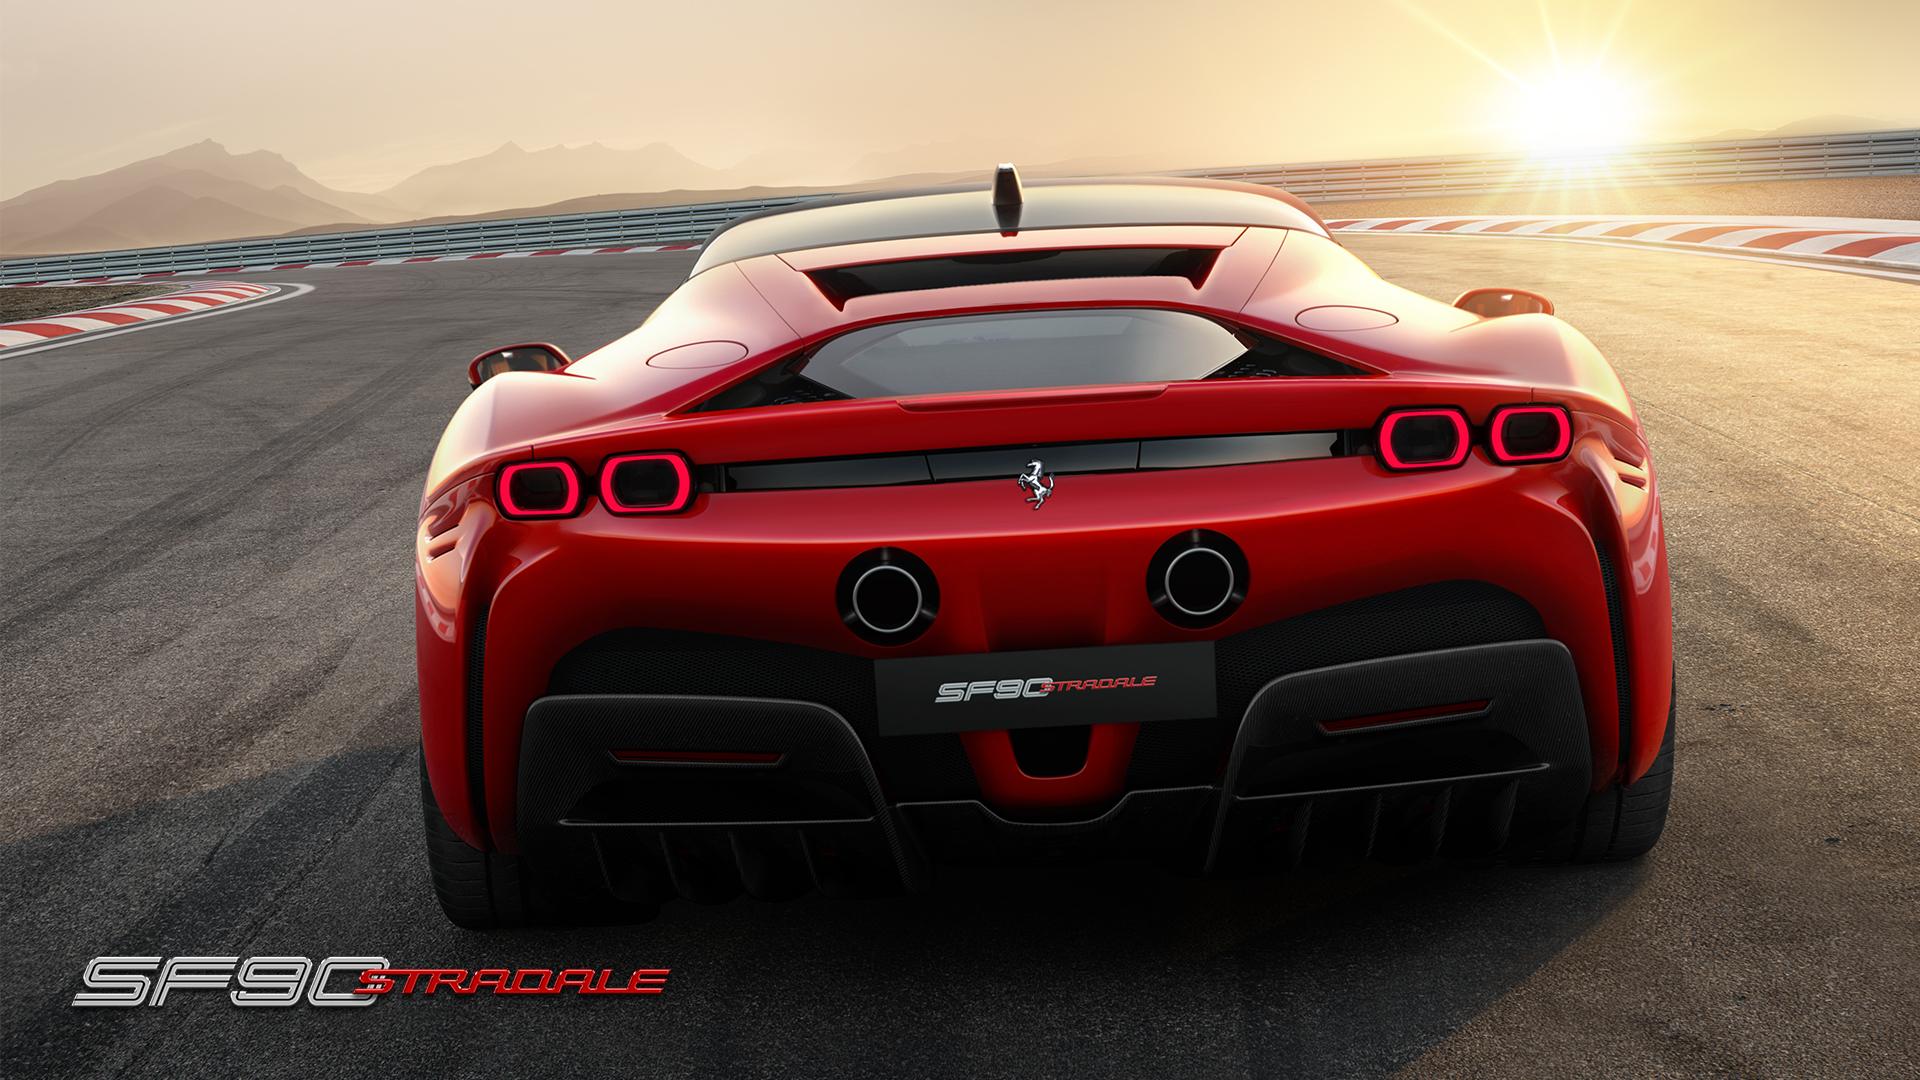 Ferrari SF90 Stradale rear